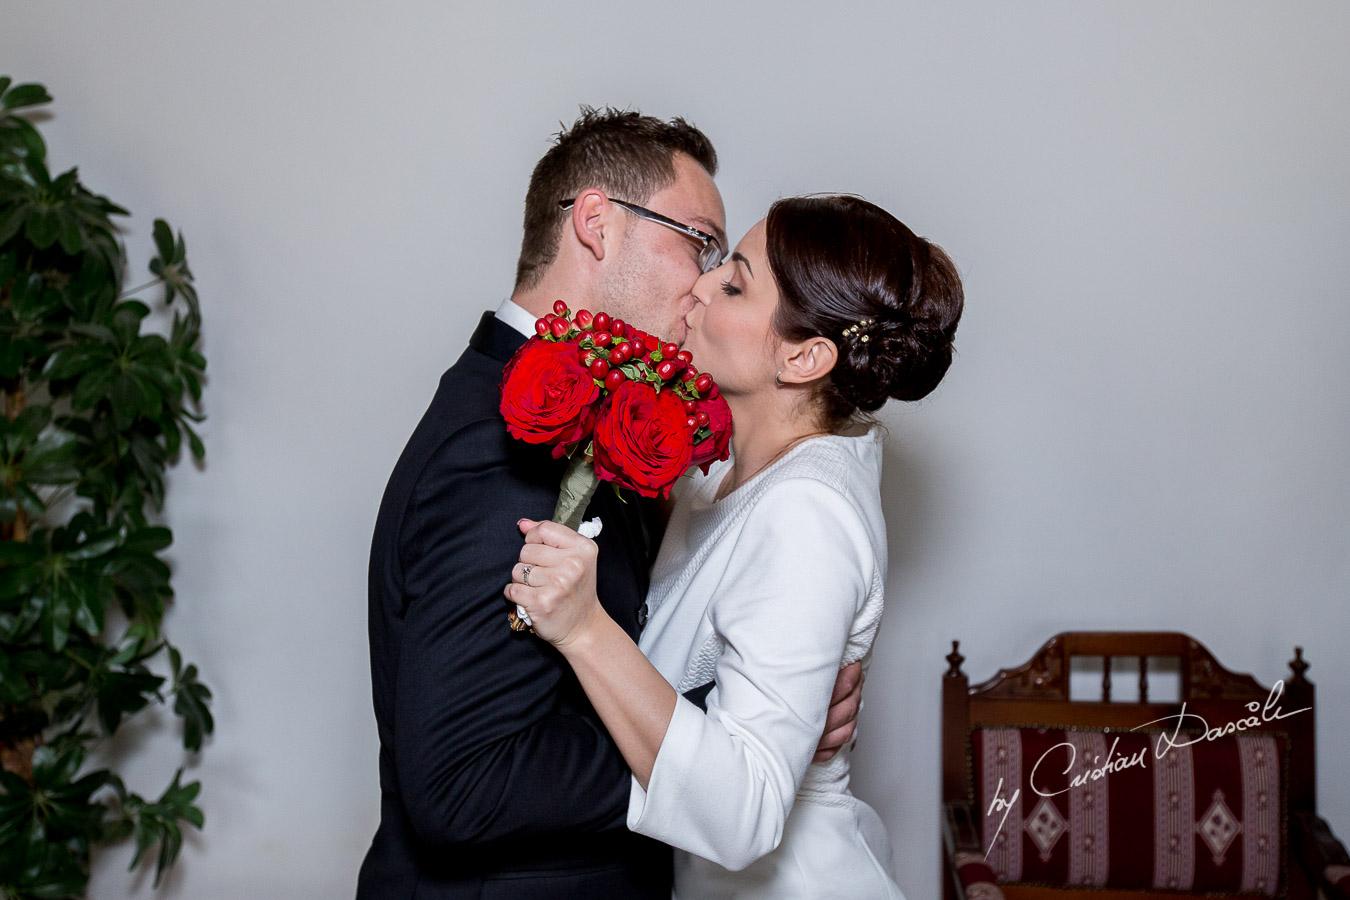 Simple Marriage Ceremony - Irina & Dragos 07